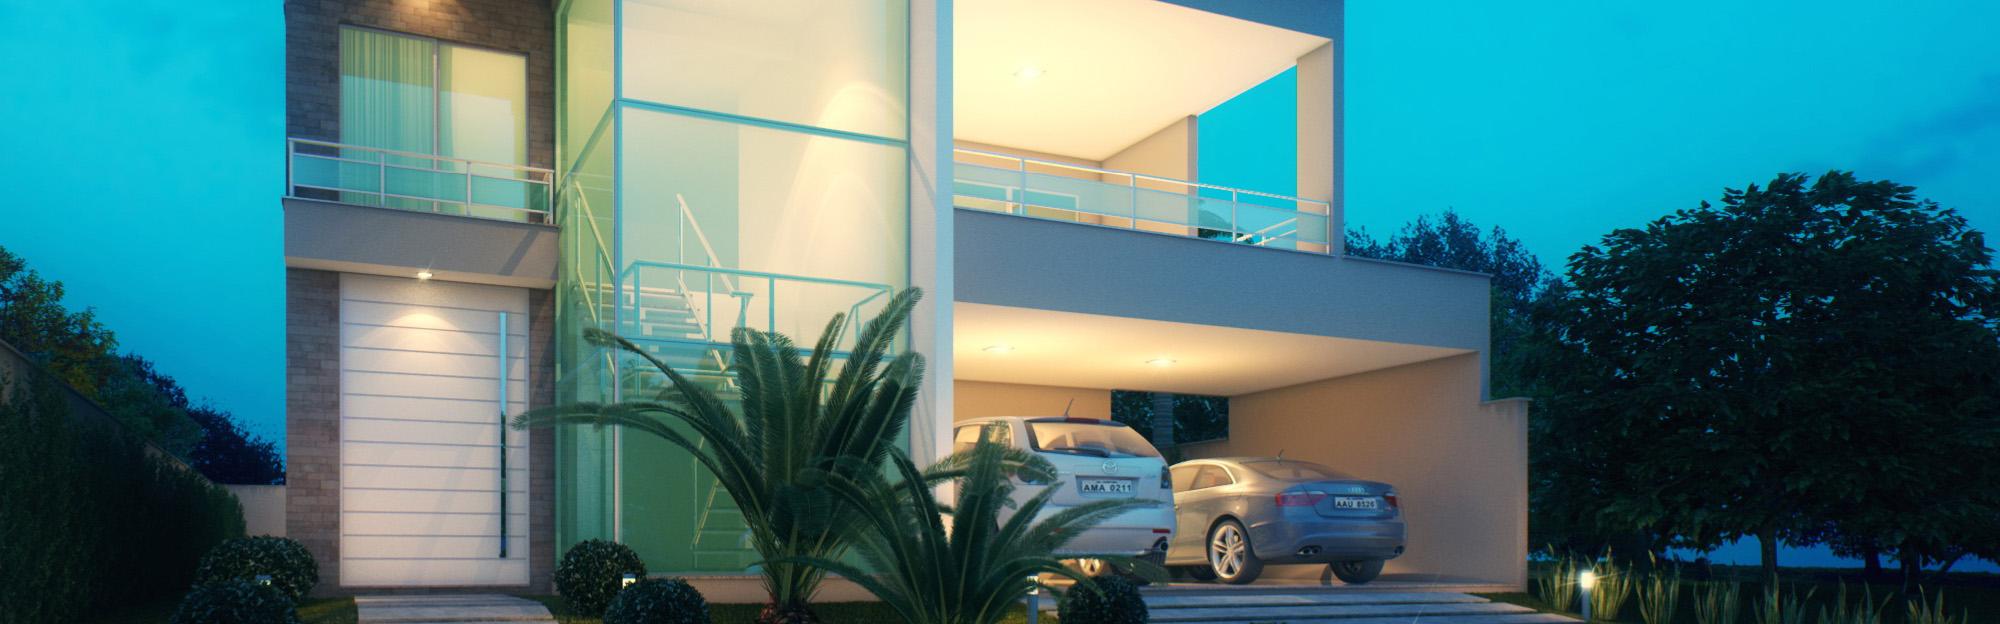 Fachada de casa de Alto padrão no condomínio Jardins Ibiza.